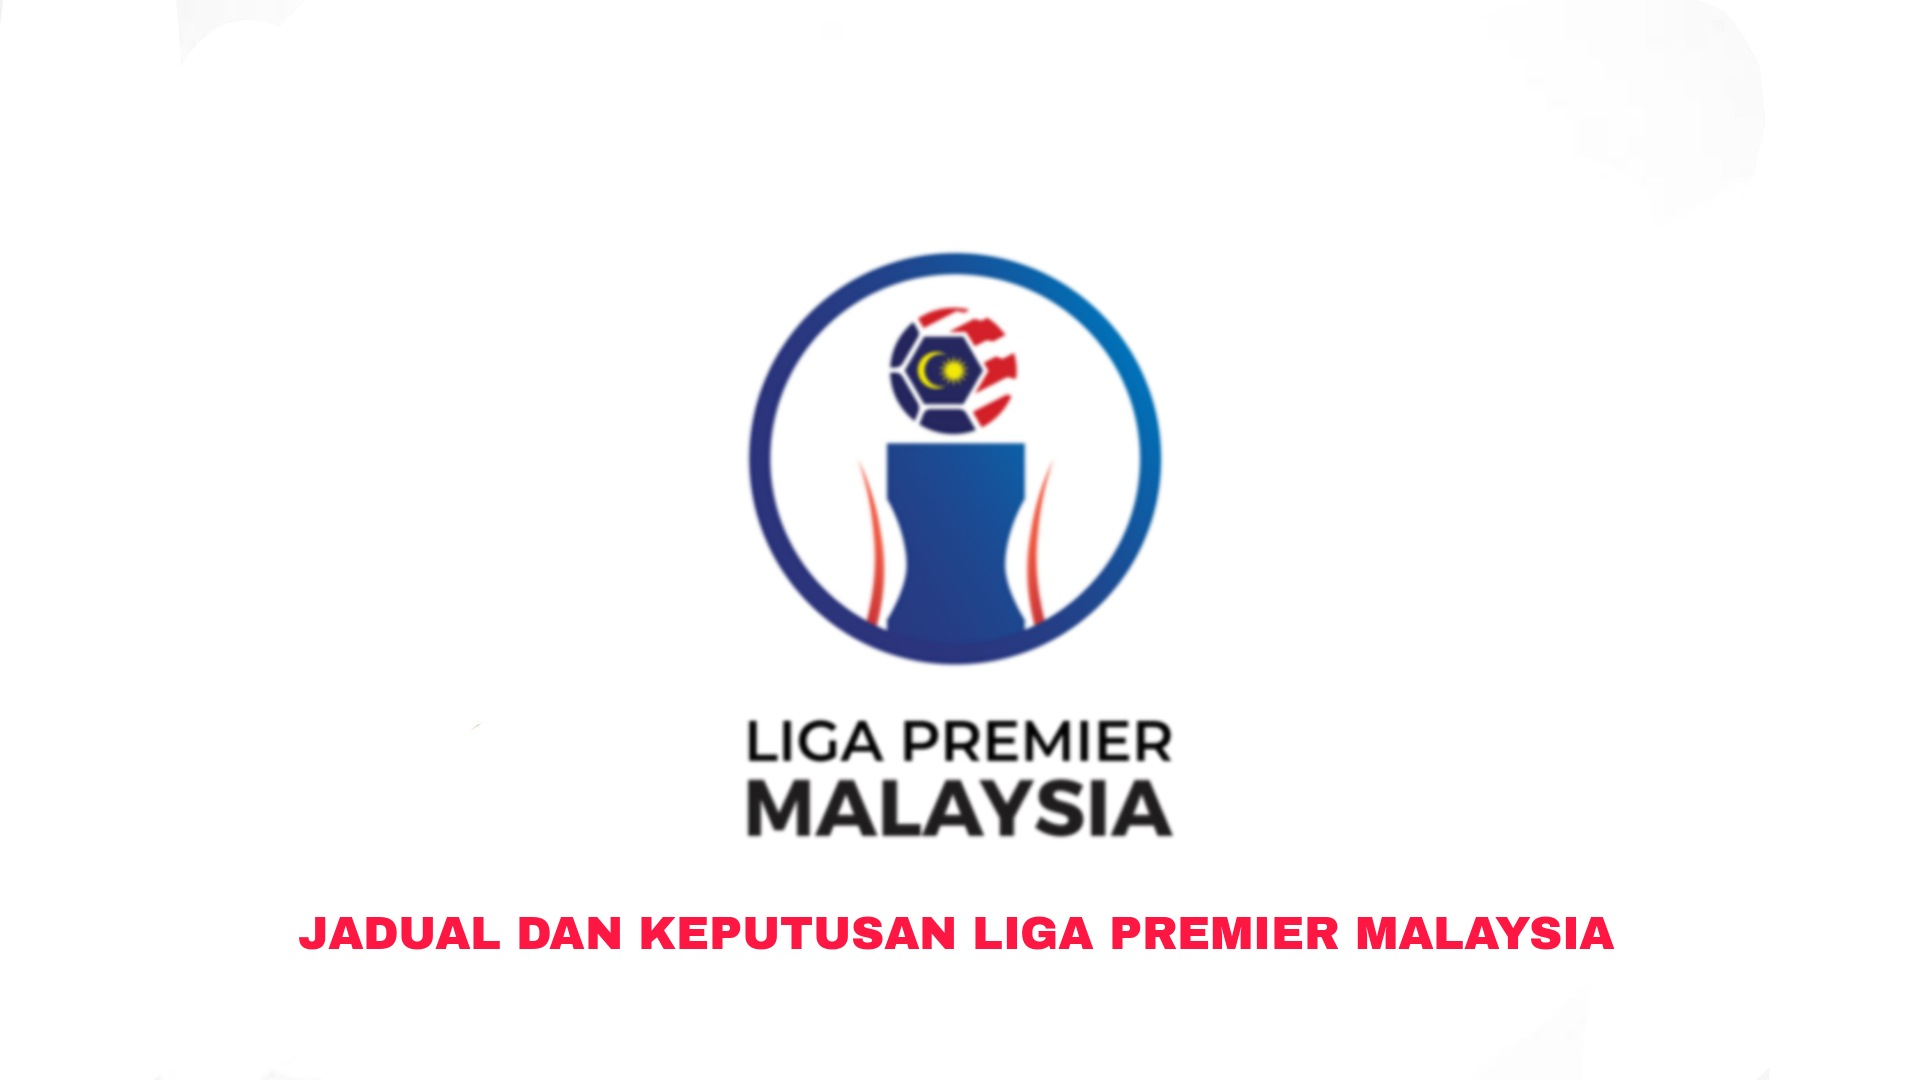 Jadual Liga Premier Malaysia 2021 (Keputusan)